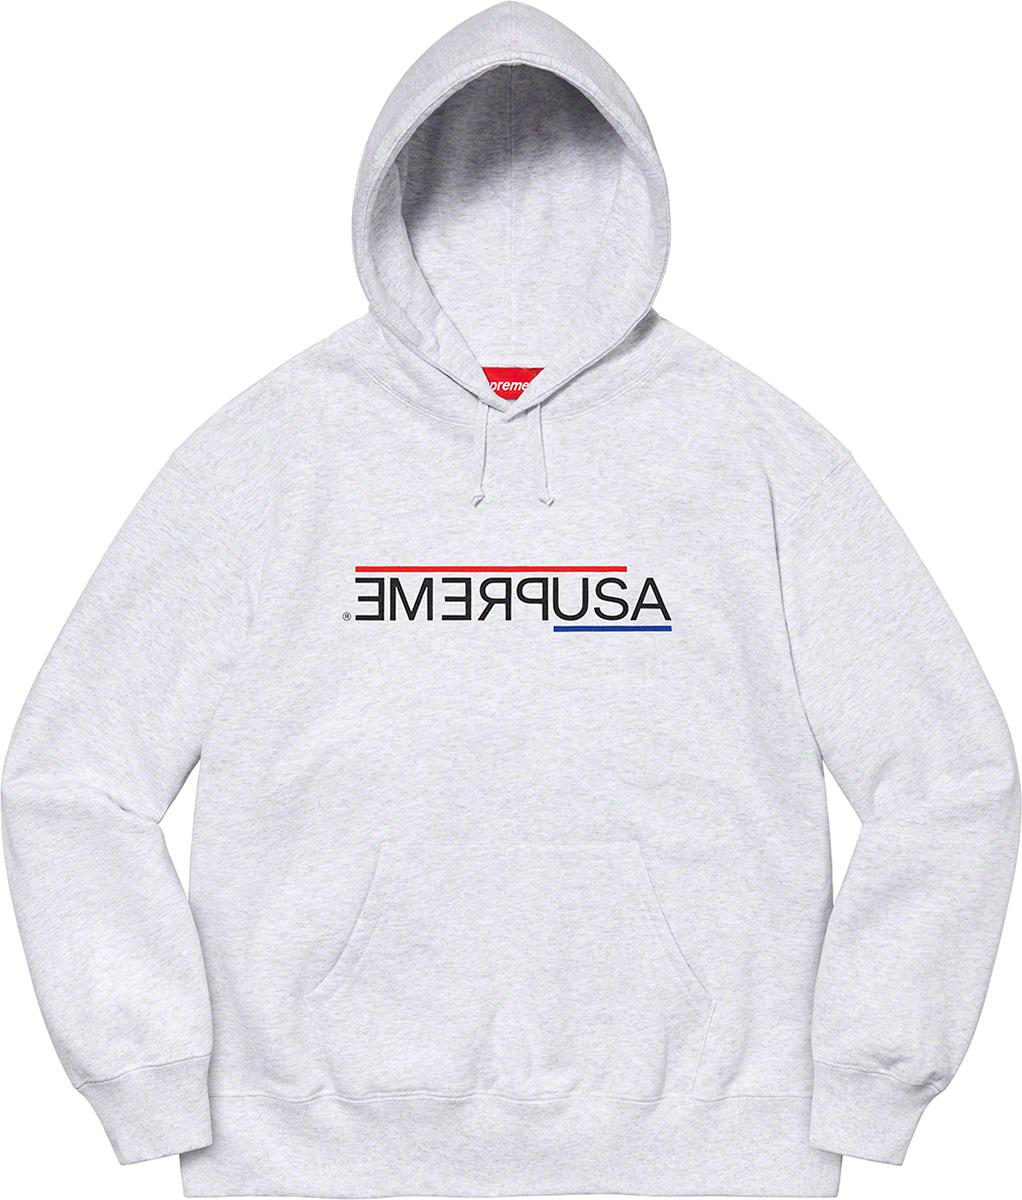 supreme-21aw-21fw-usa-hooded-sweatshirt